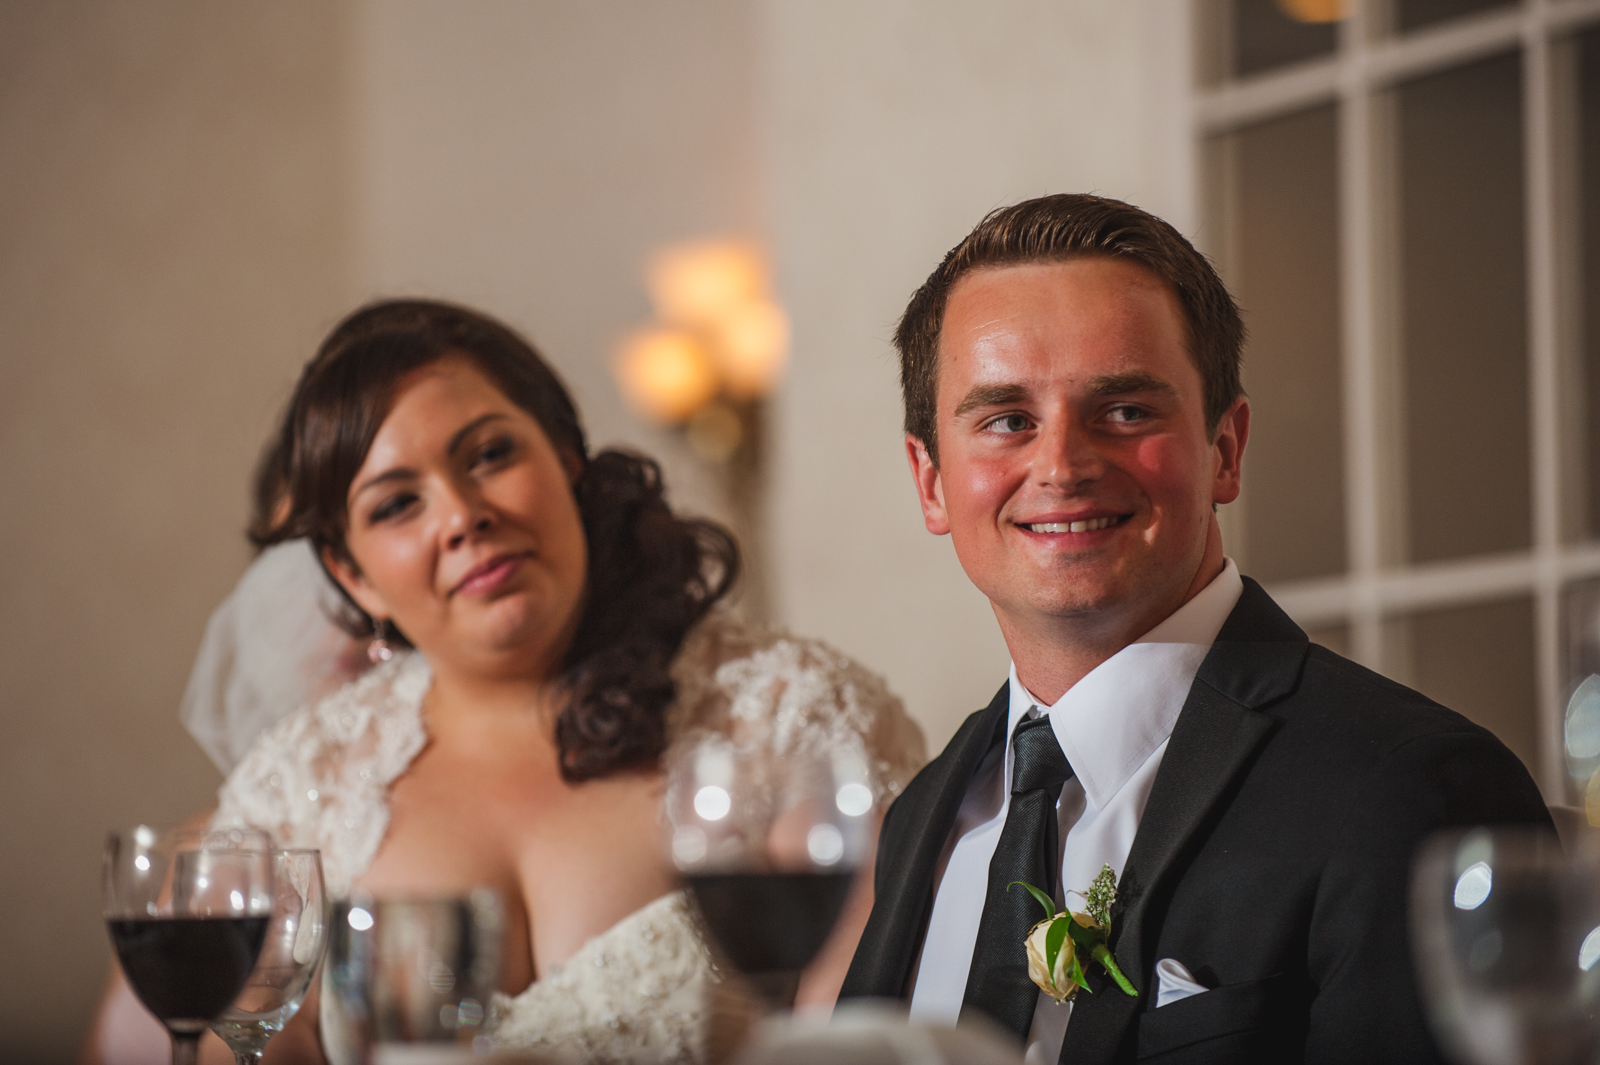 bc-wedding-photographers-harrison-lake-wedding-56.jpg